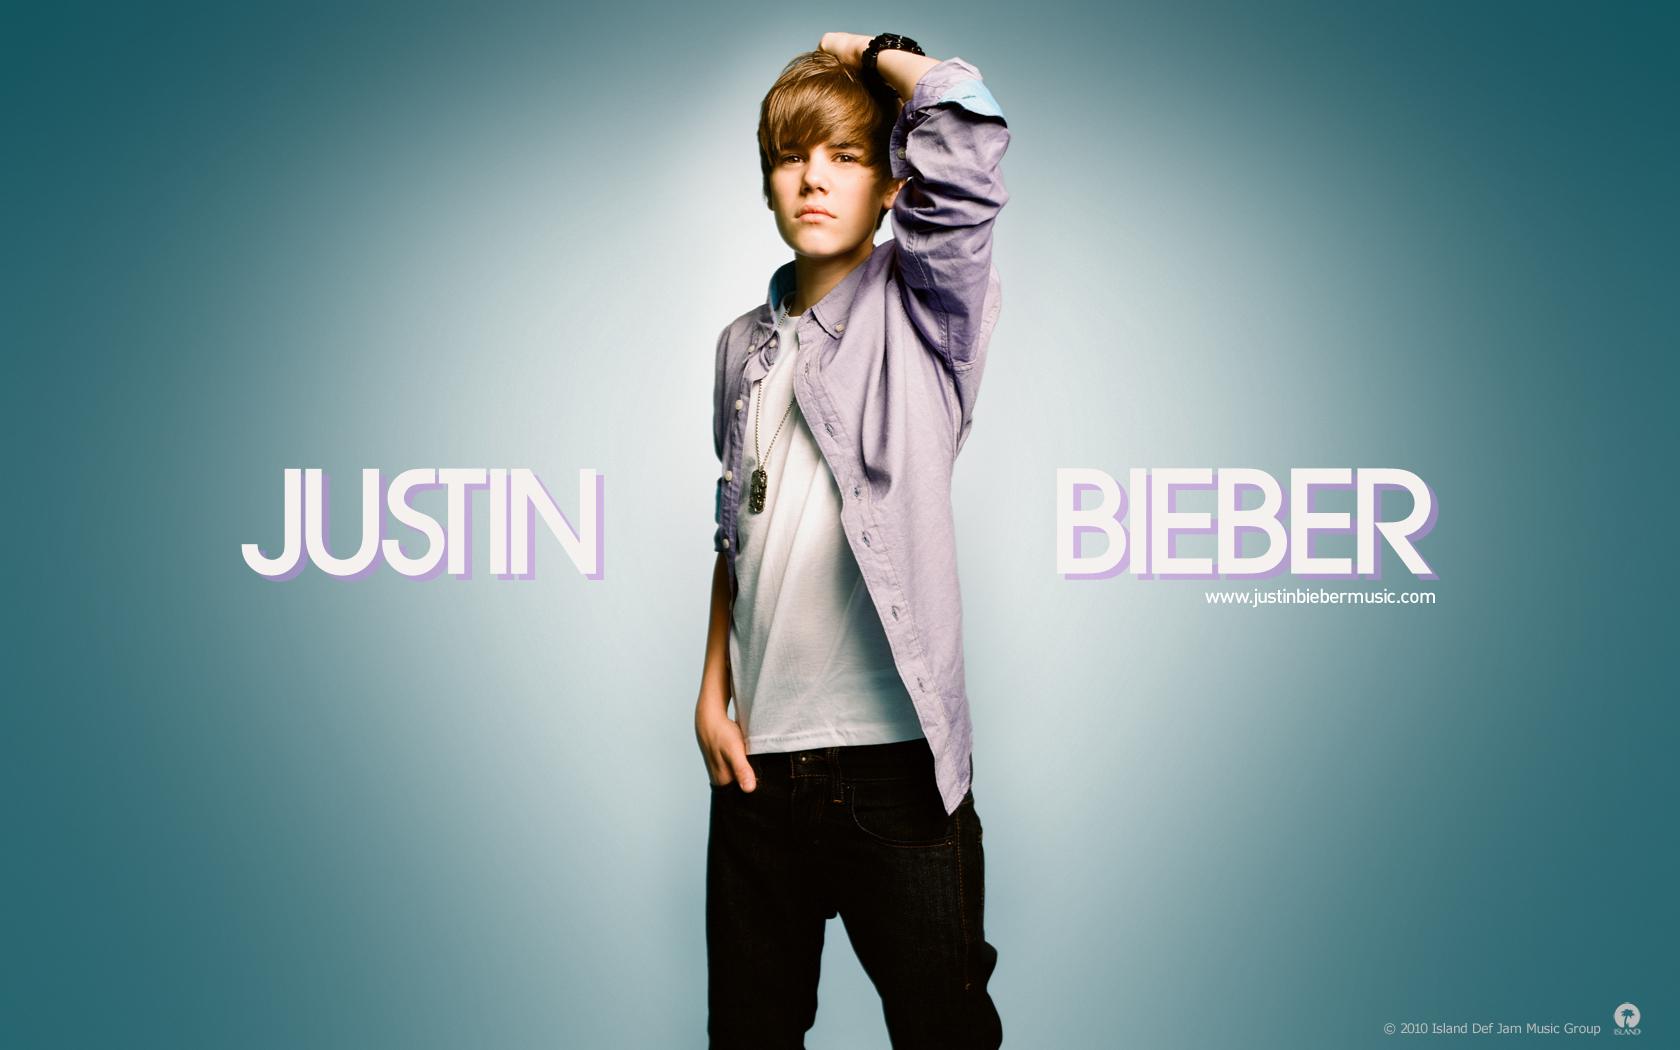 Justin Bieber - Justin Bieber Wallpaper (15246828) - Fanpop